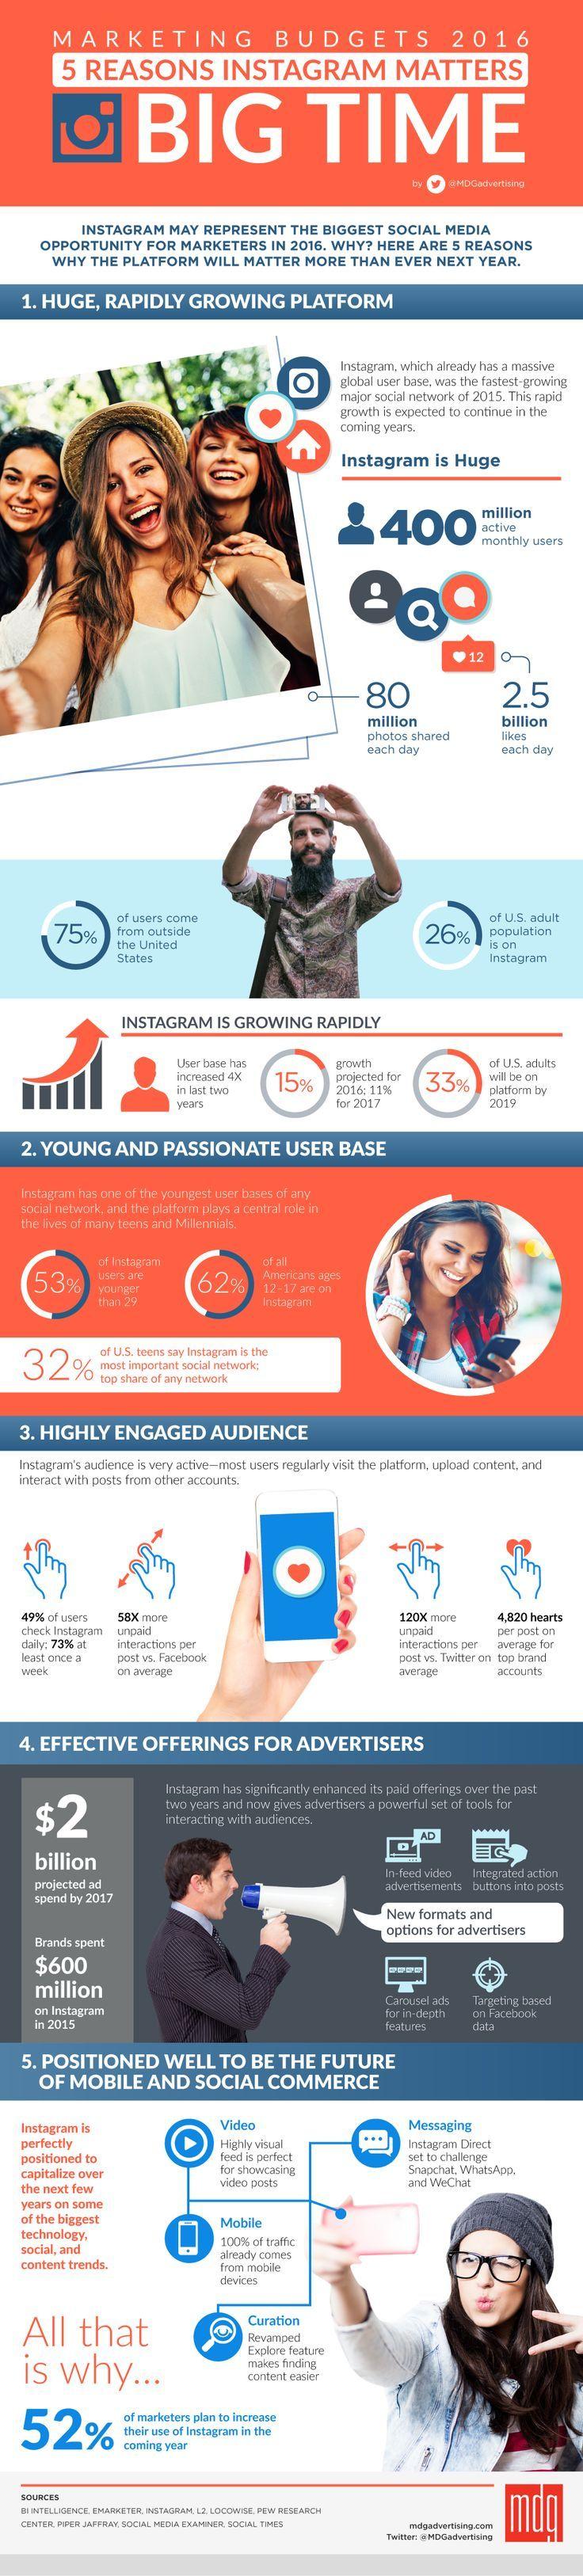 http://social-media-strategy-template.blogspot.com/ Social Media Marketing Budgets 2016: 5 Reasons Instagram Matters, Big Time - #infographic